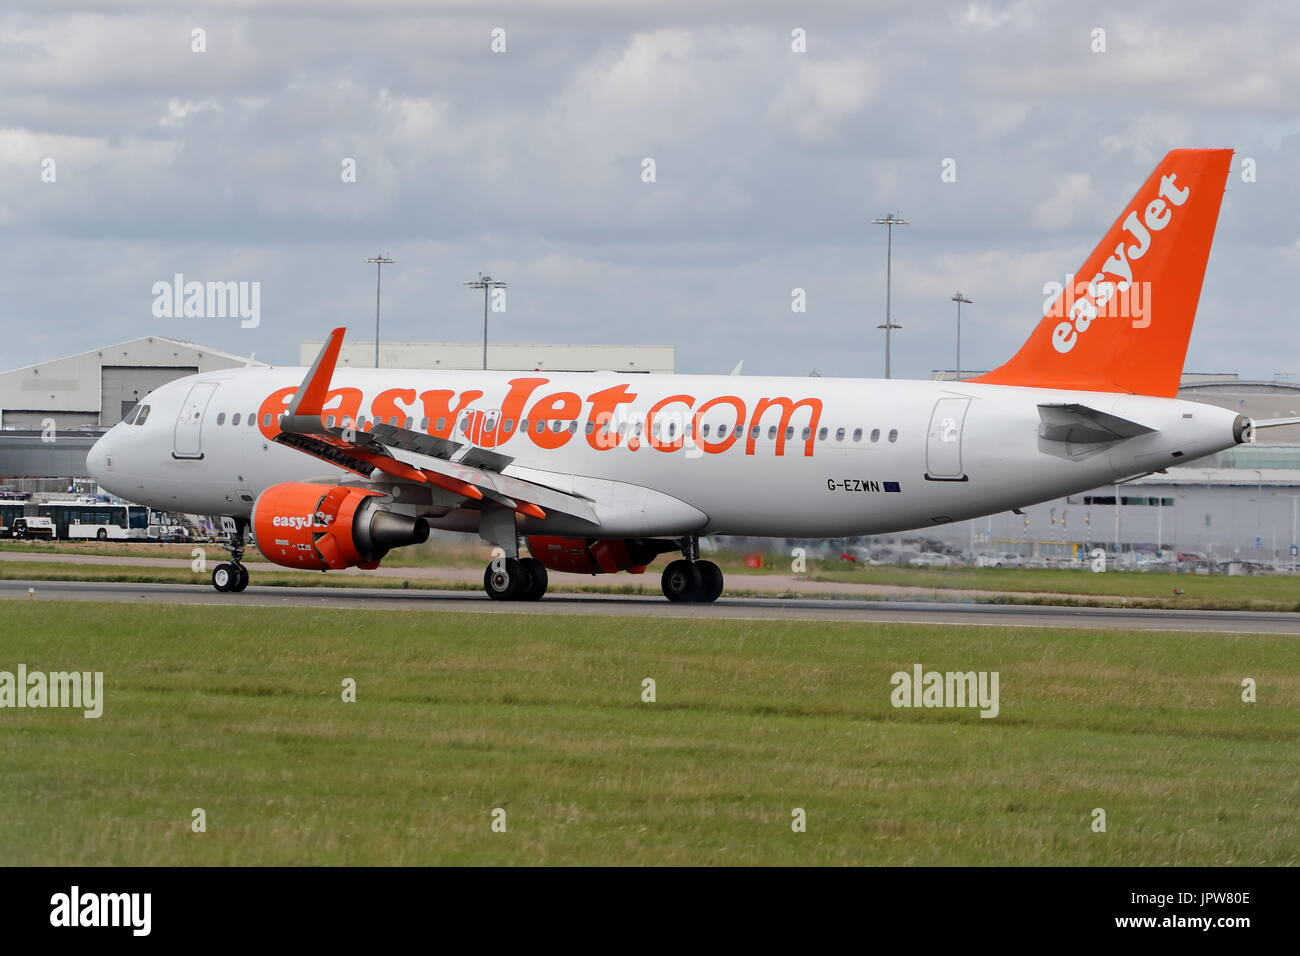 Easyjet Airbus A320 G-EZWN landing at London Luton Airport, UK - Stock Image